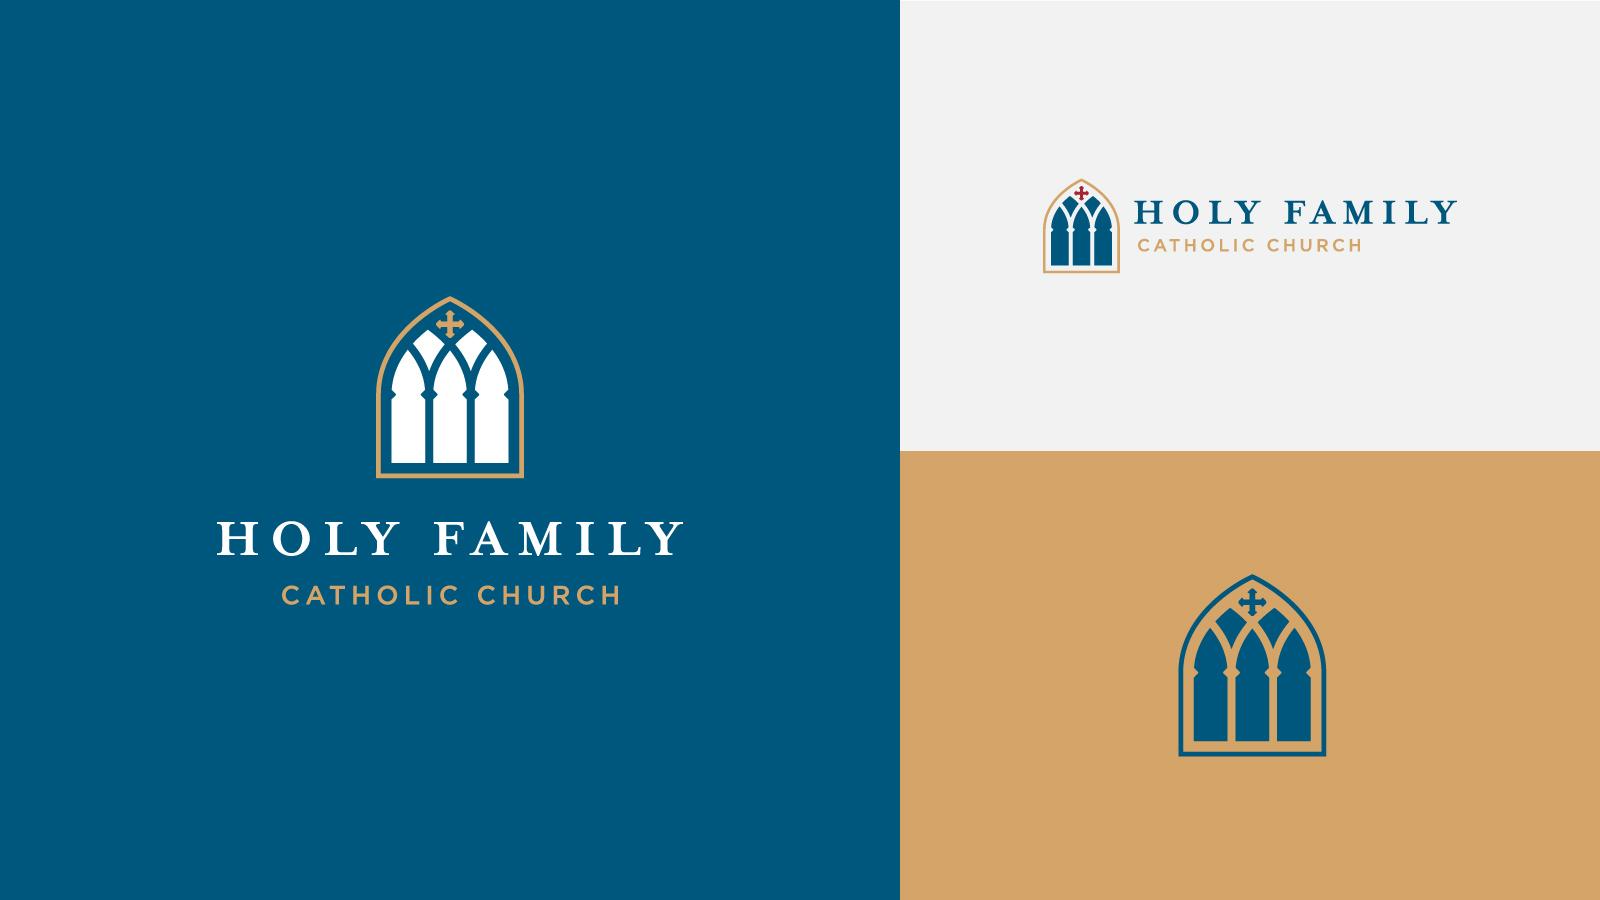 Holy_Family_1600x900_Logos_ALL.jpg